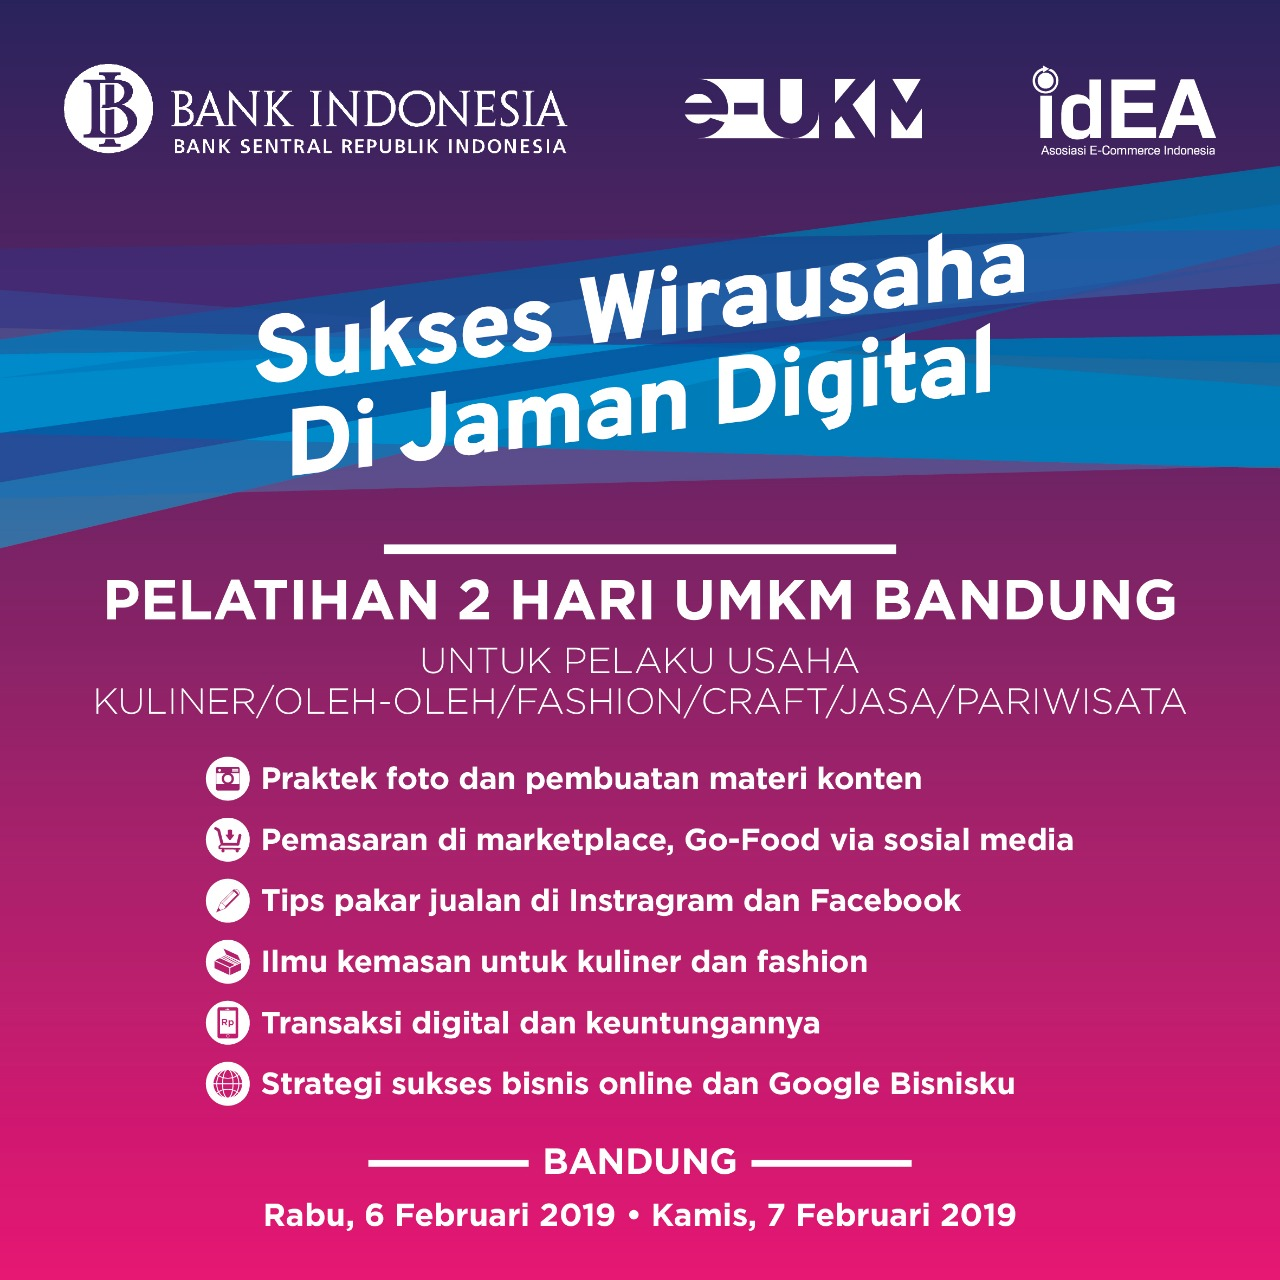 Sukses Witausaha di Jaman Digital